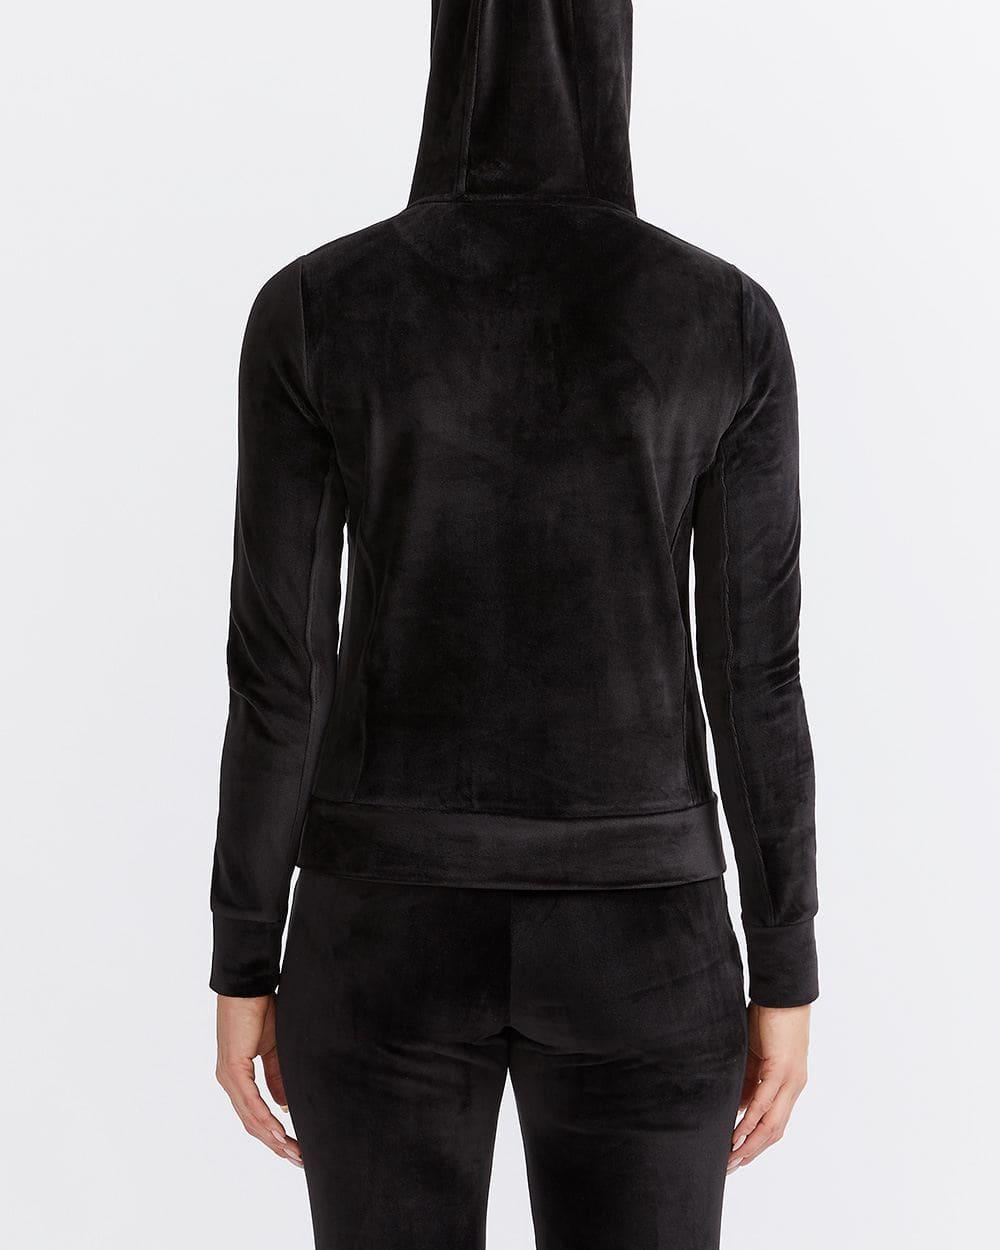 Hyba Velvet Jacket